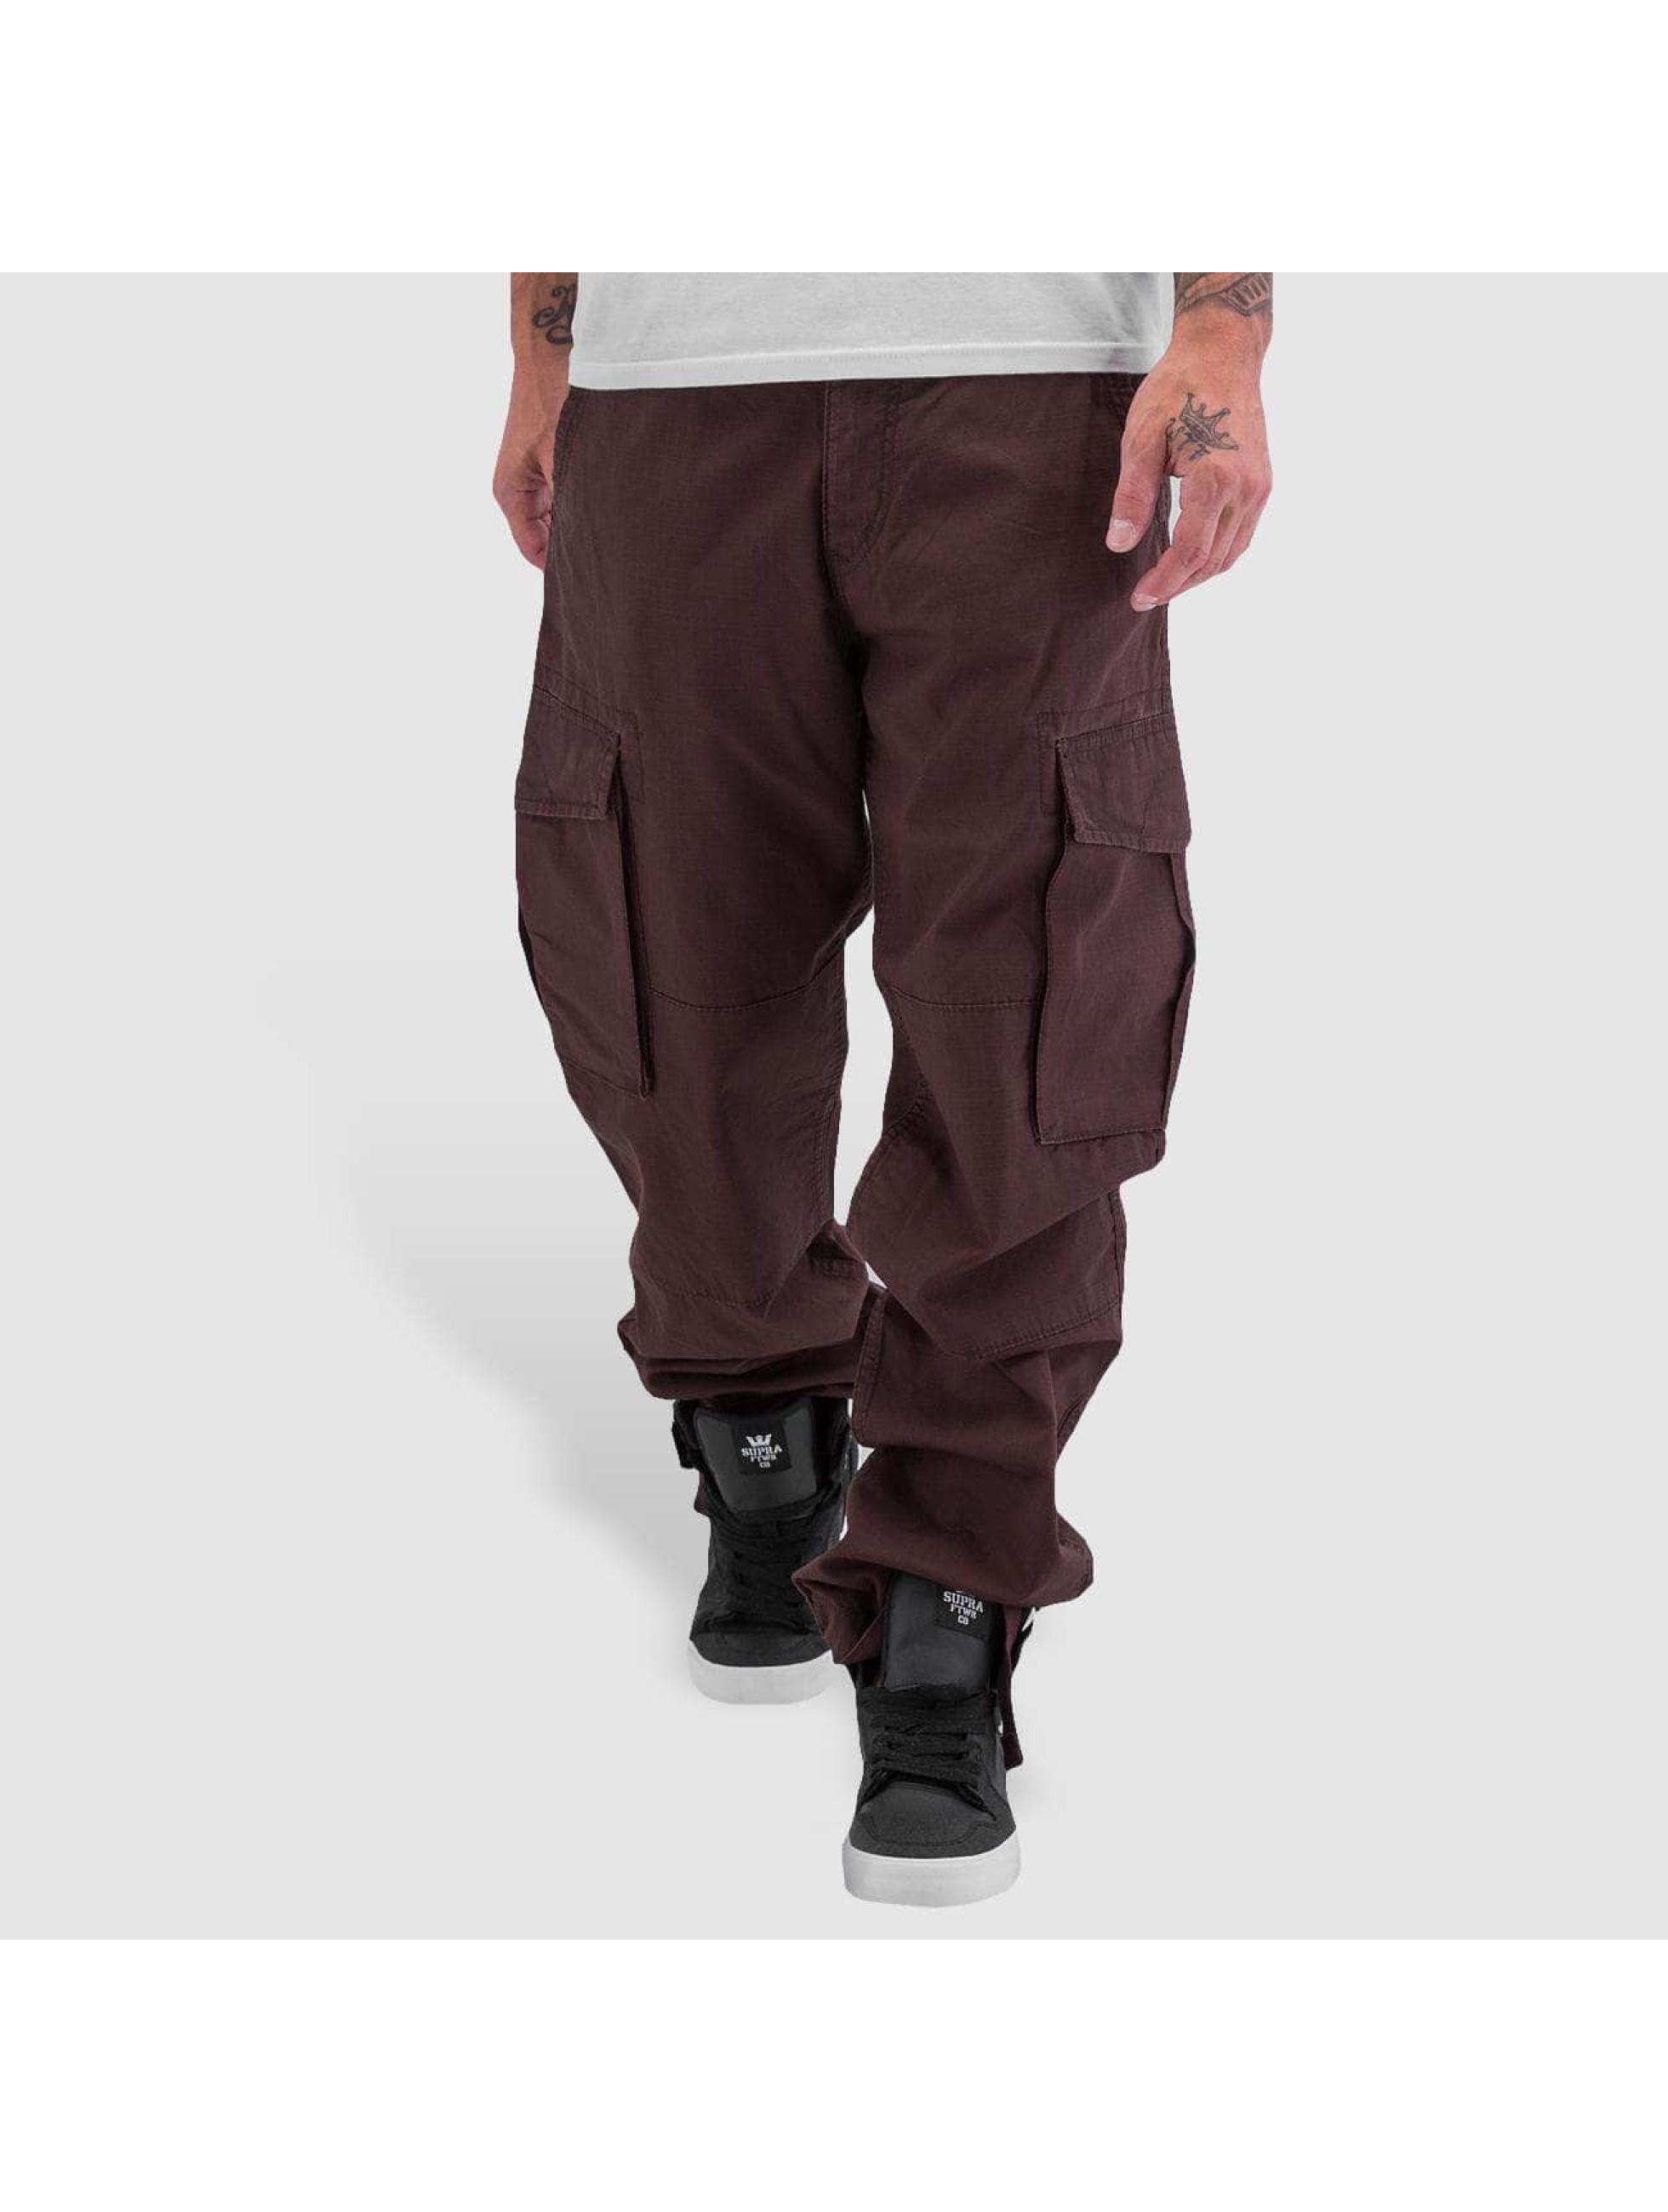 Reell Jeans Männer Cargohose Ripstop in braun